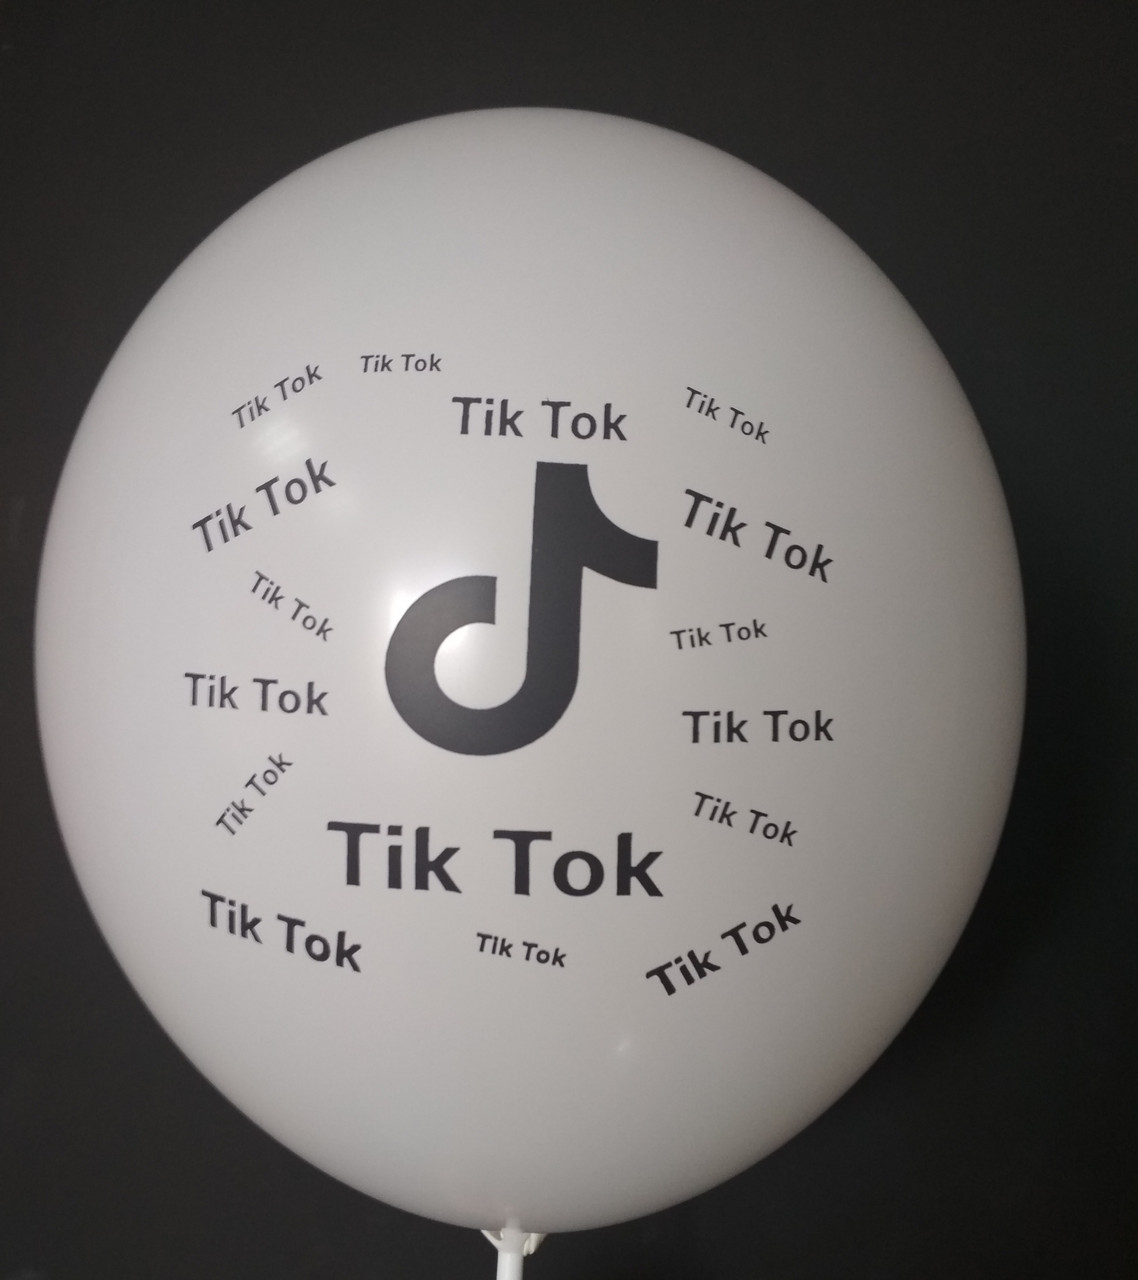 "Латексный шар с рисунком Tik Tok белый 002 12 ""30см Belbal ТМ"" Star """